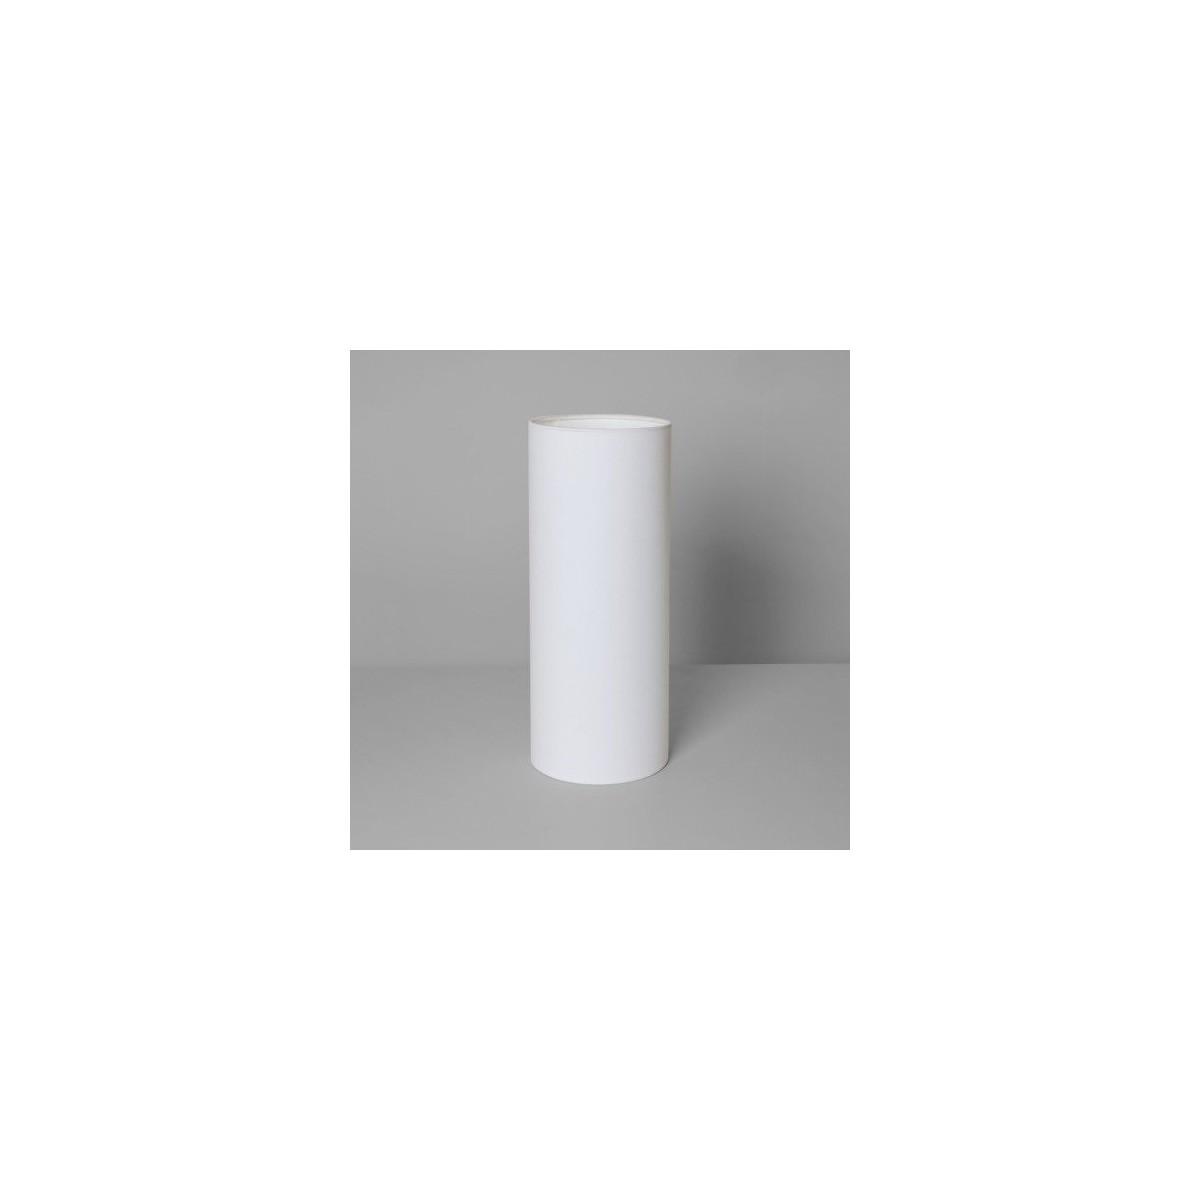 Astro Tube 135 Abażur Biały 5015004